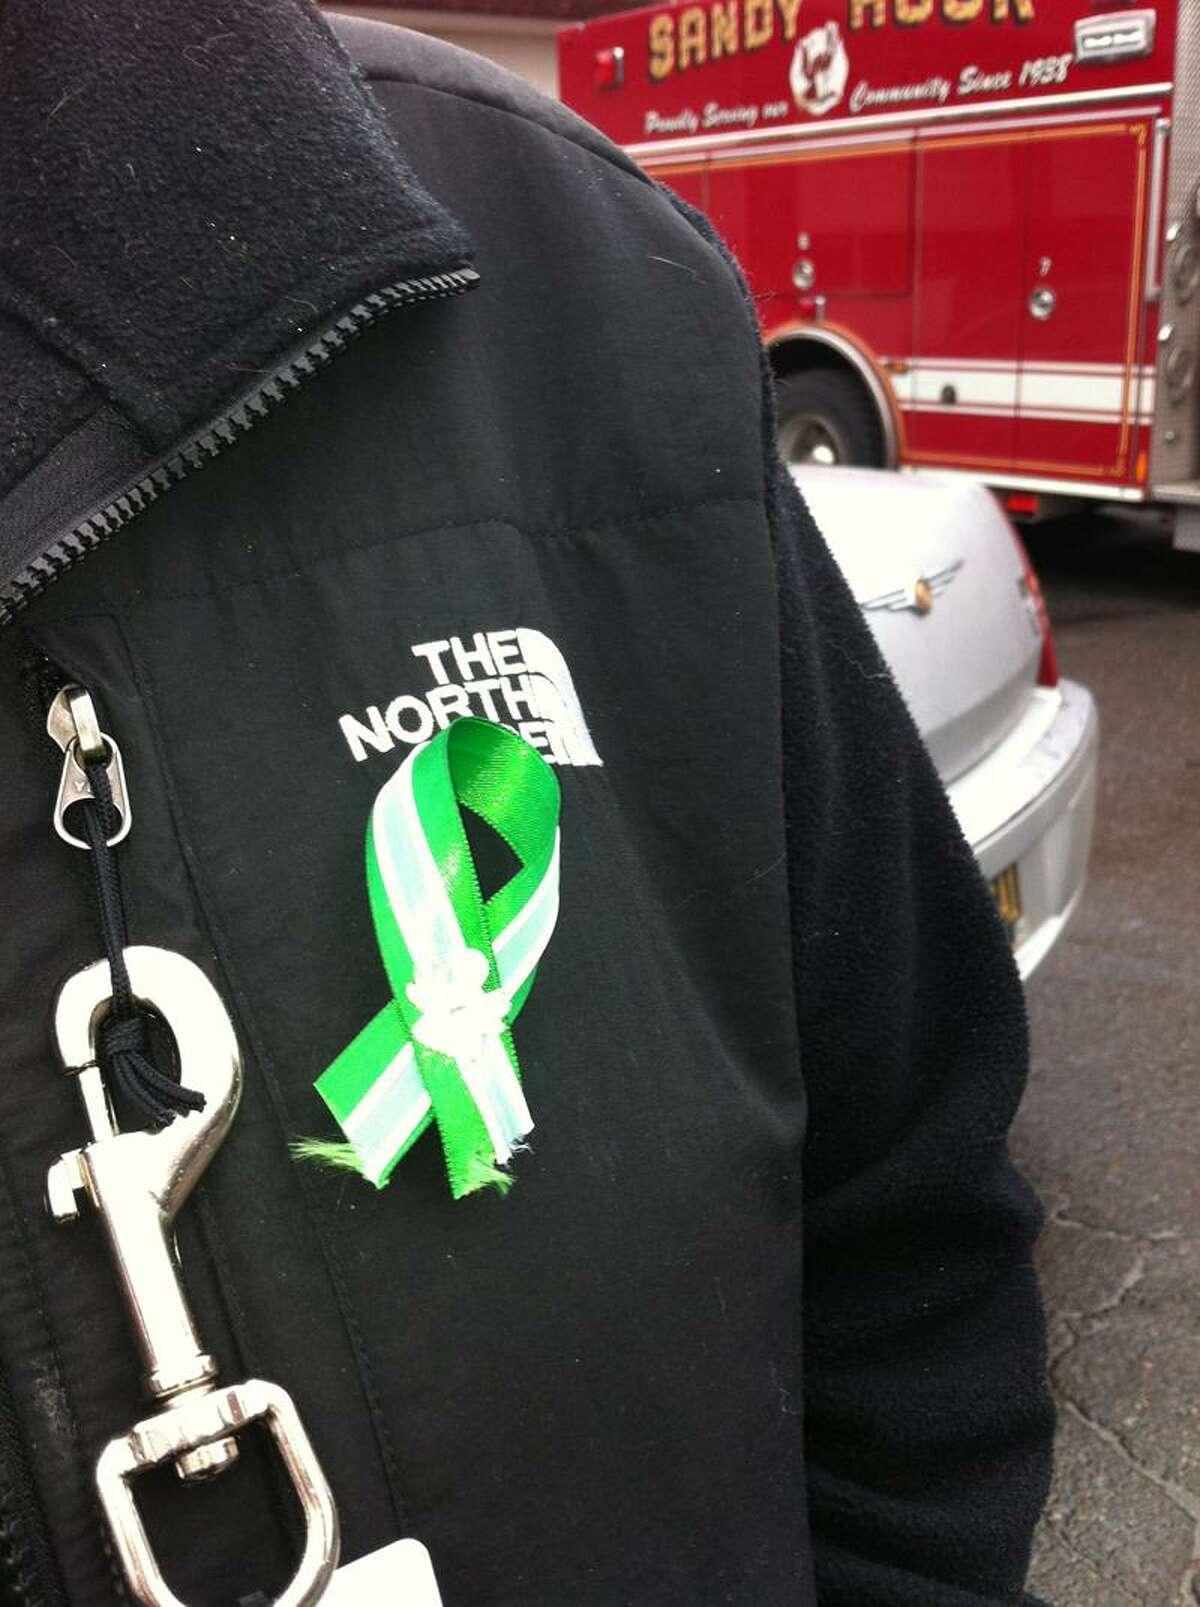 Sandy Hook firefighter Kelly Burton's green and white ribbon. Photo by Mark Zaretsky/New Haven Register